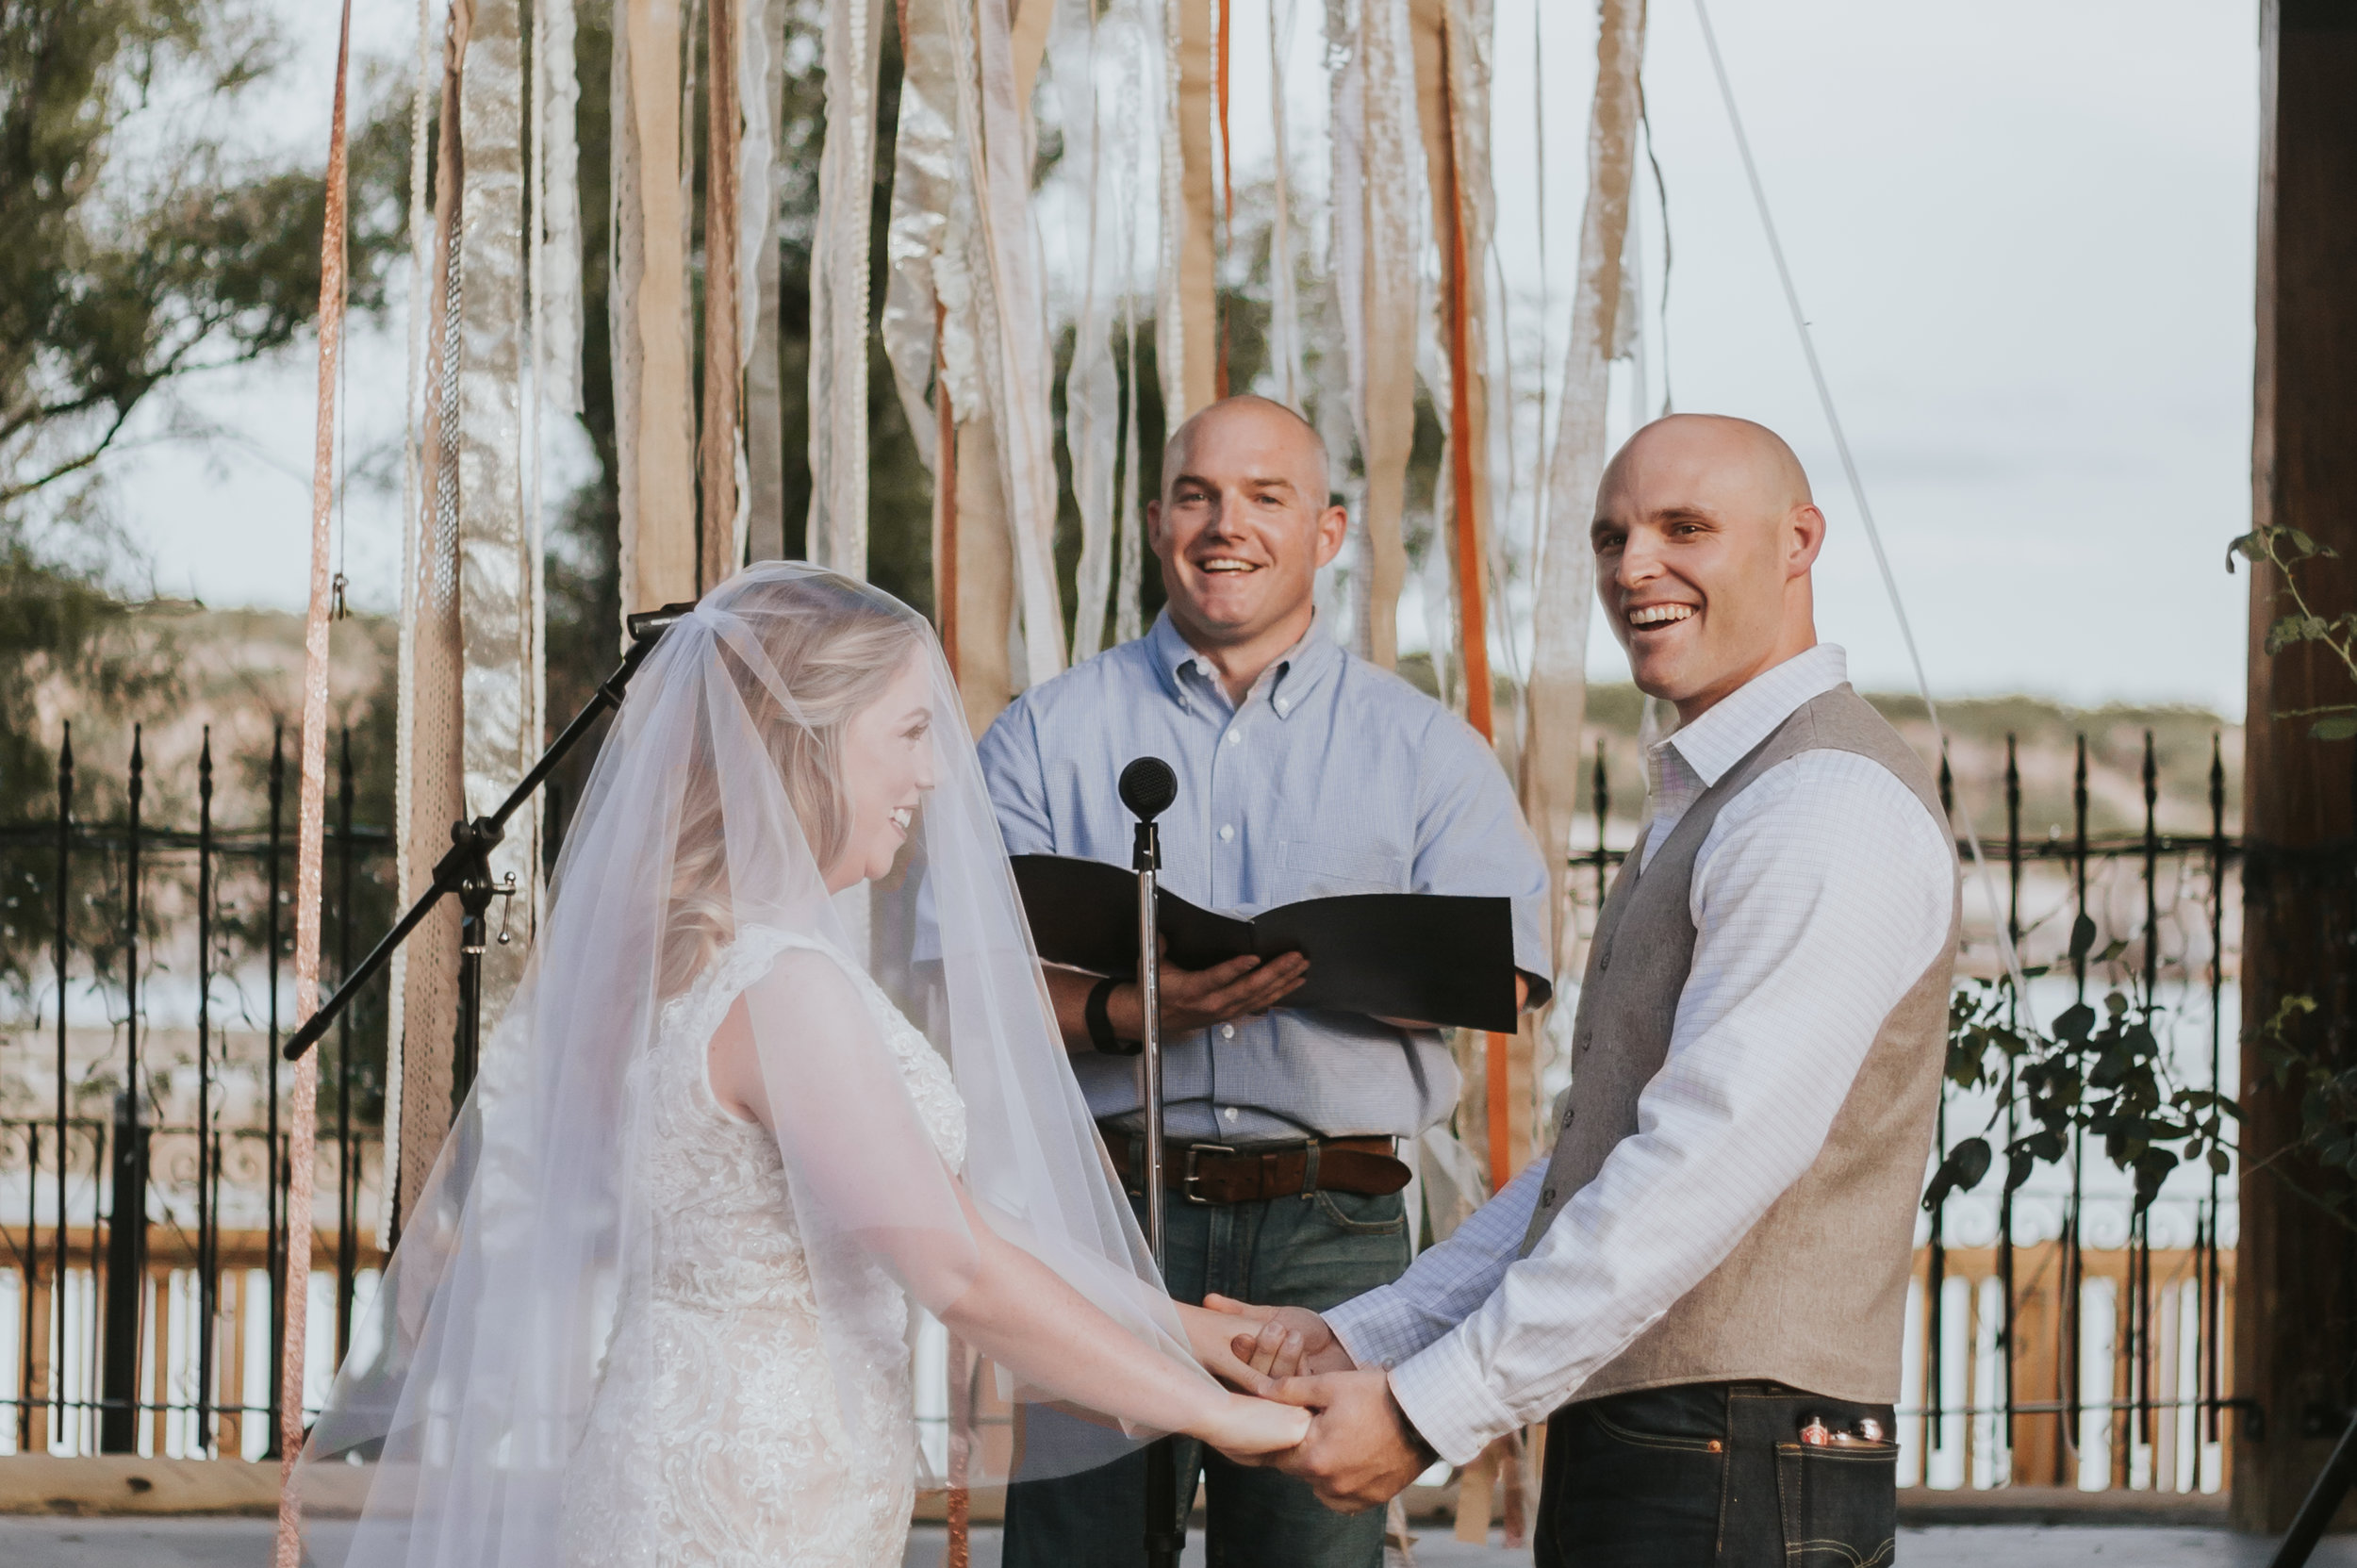 william-taylor-fabens-texas-wedding-32